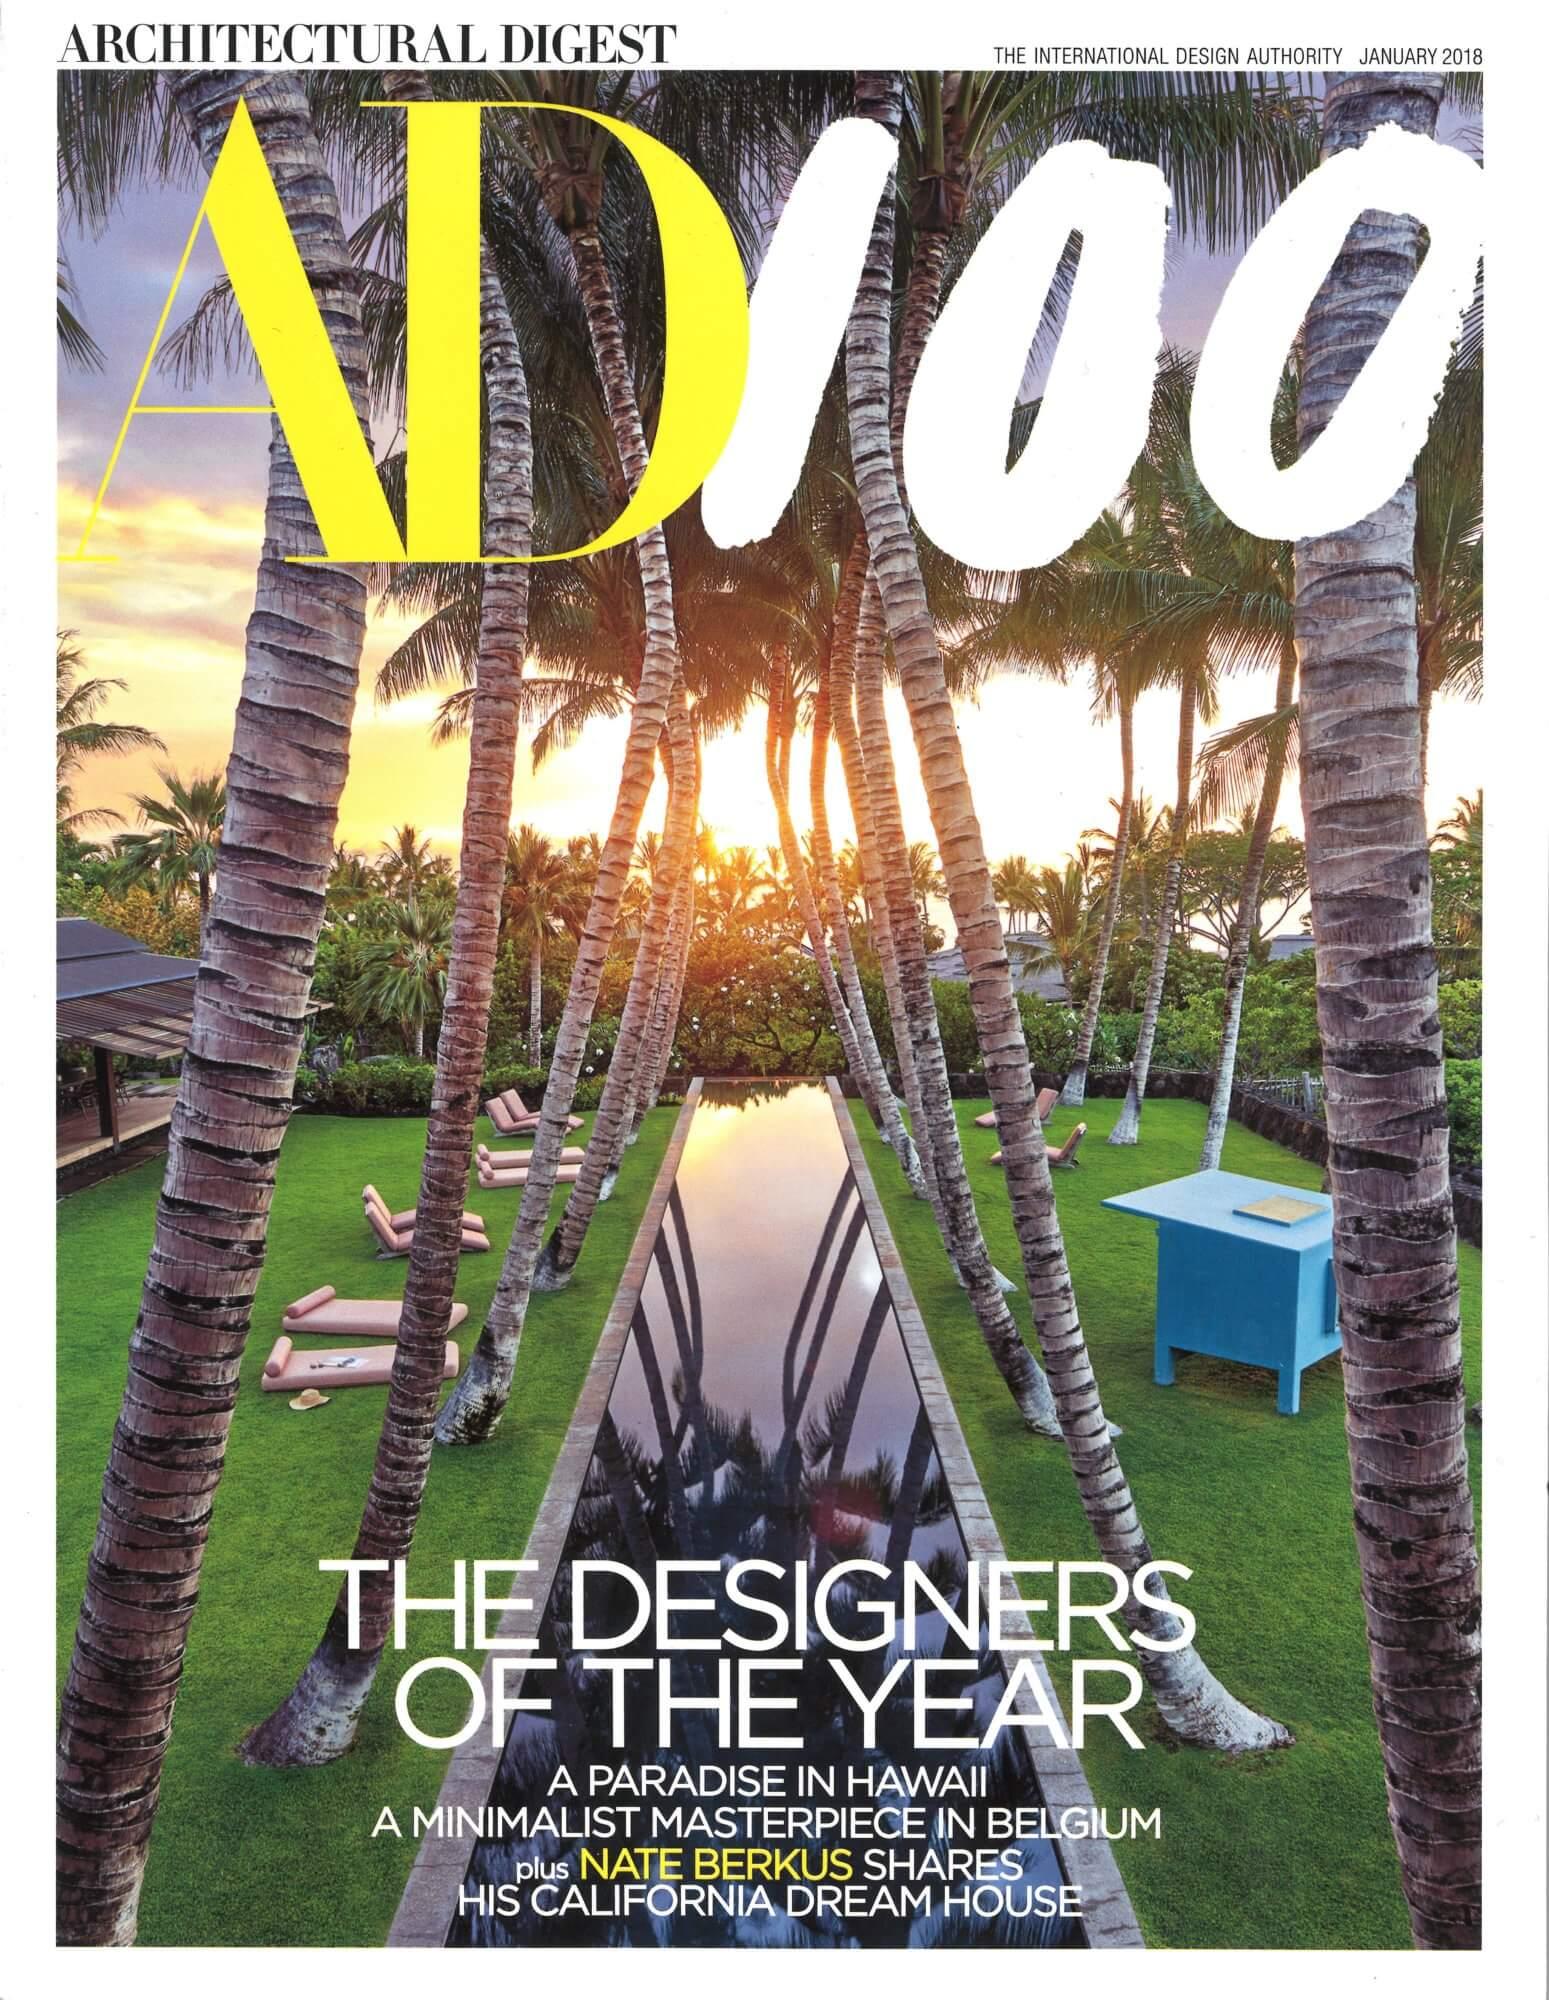 The designers of the year - India Mahdavi